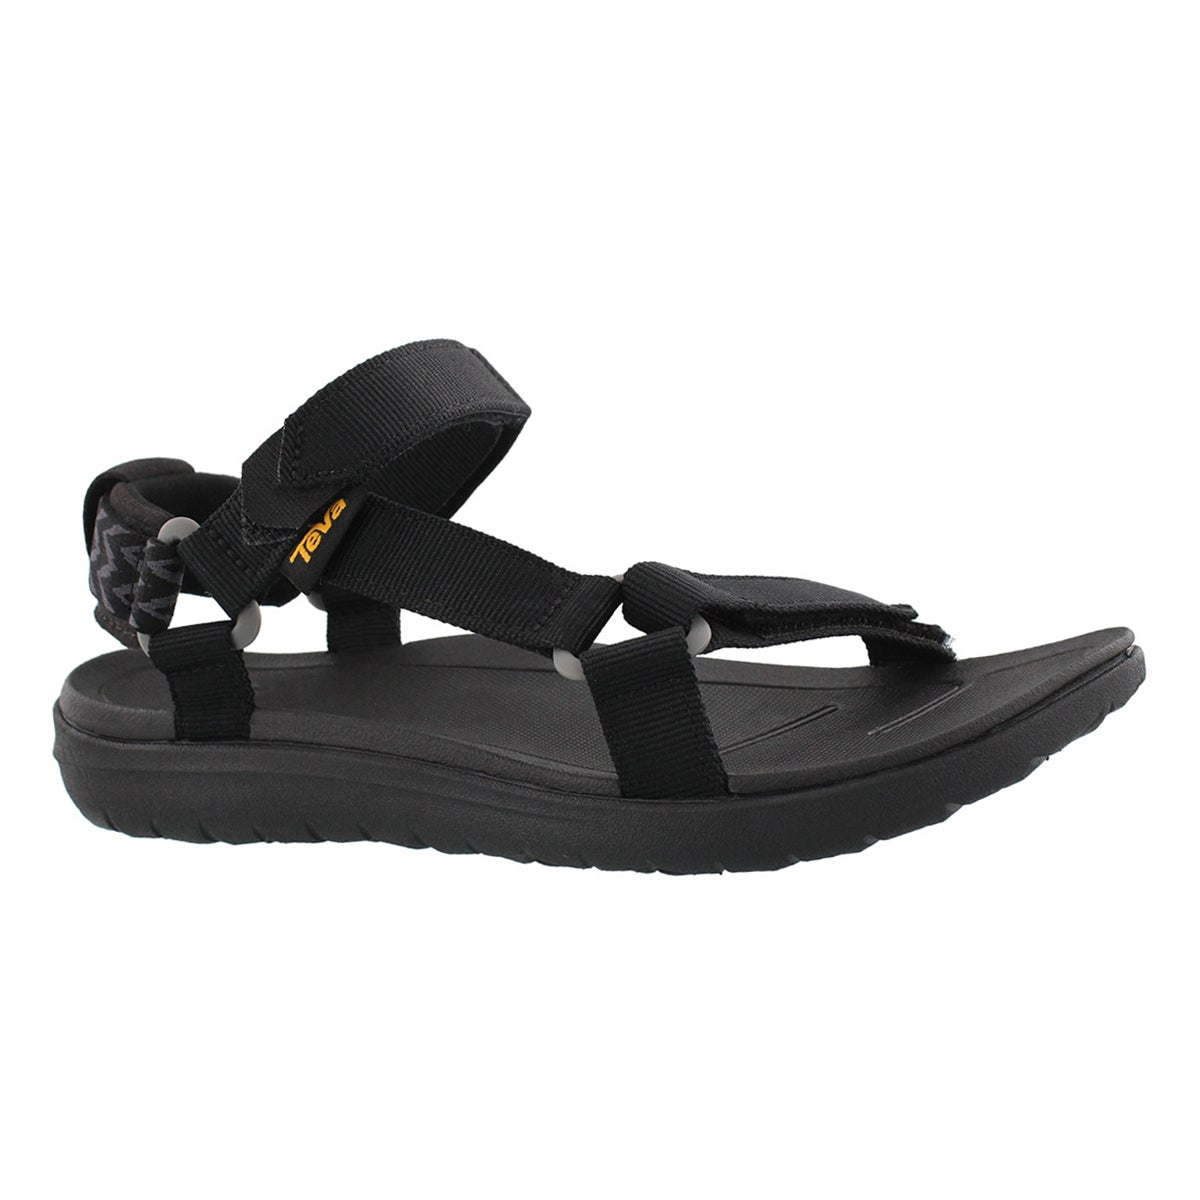 Women's SANBORN UNIVERSAL black sport sandals